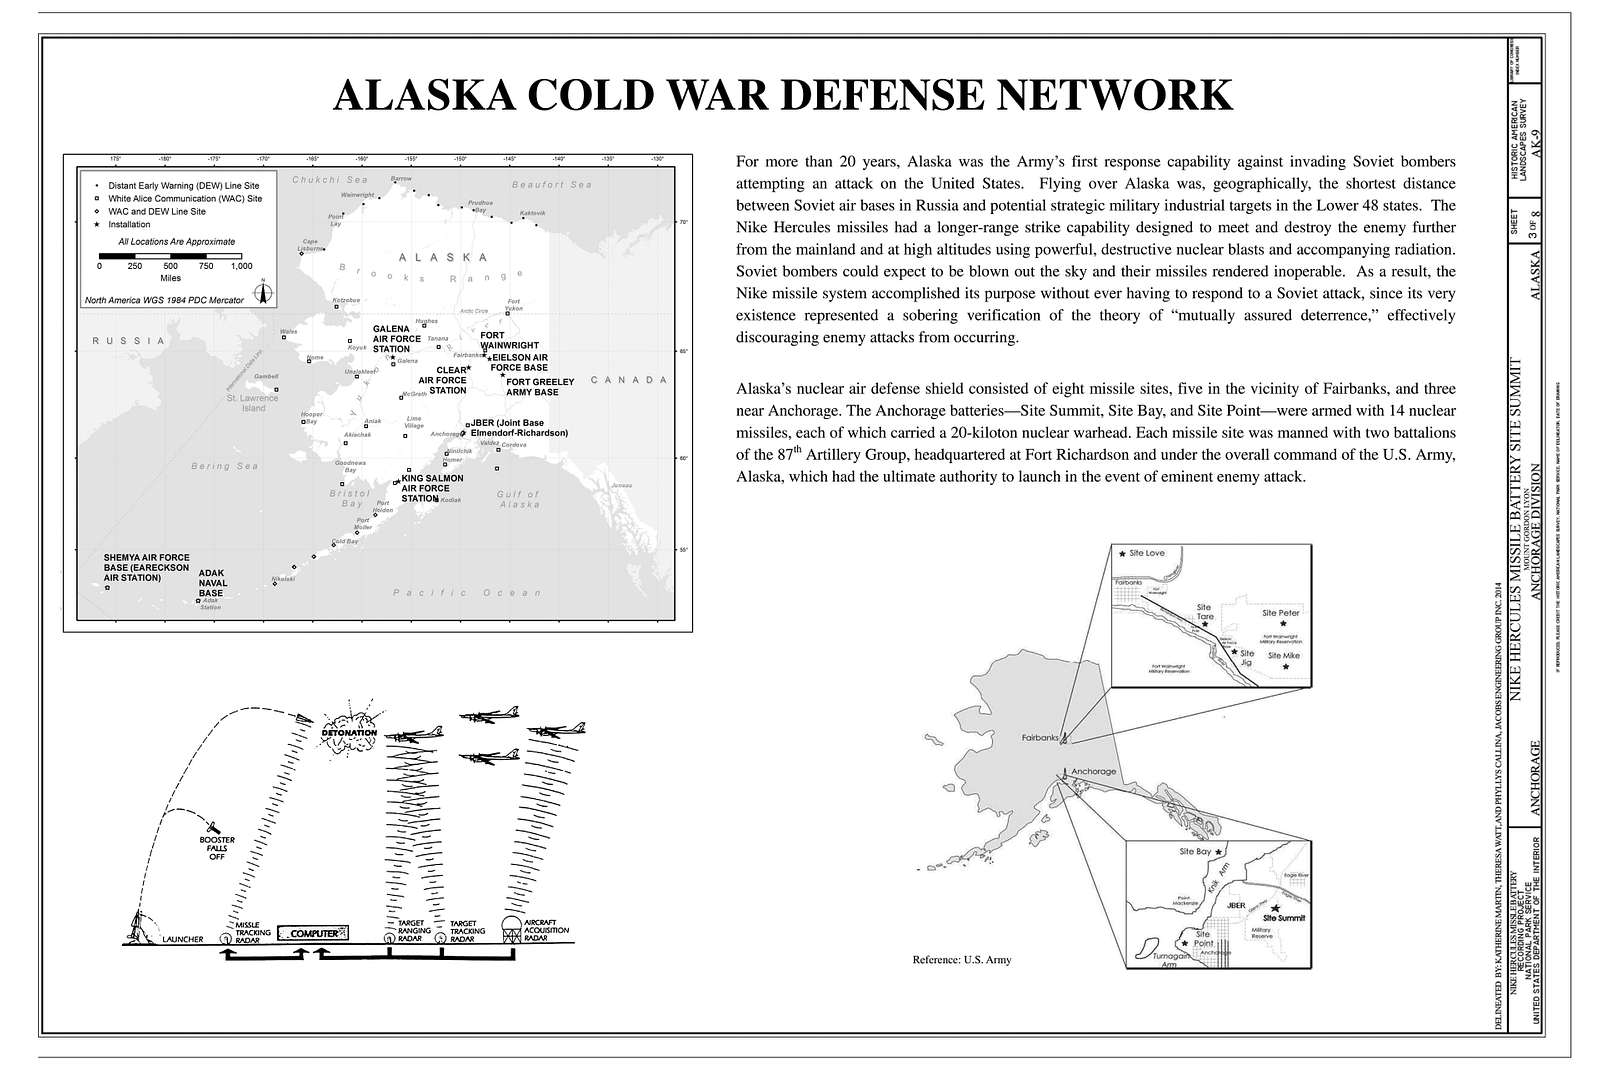 Nike Hercules Missile Battery Site Summit, Mount Gordon Lyon, Anchorage, Anchorage, AK